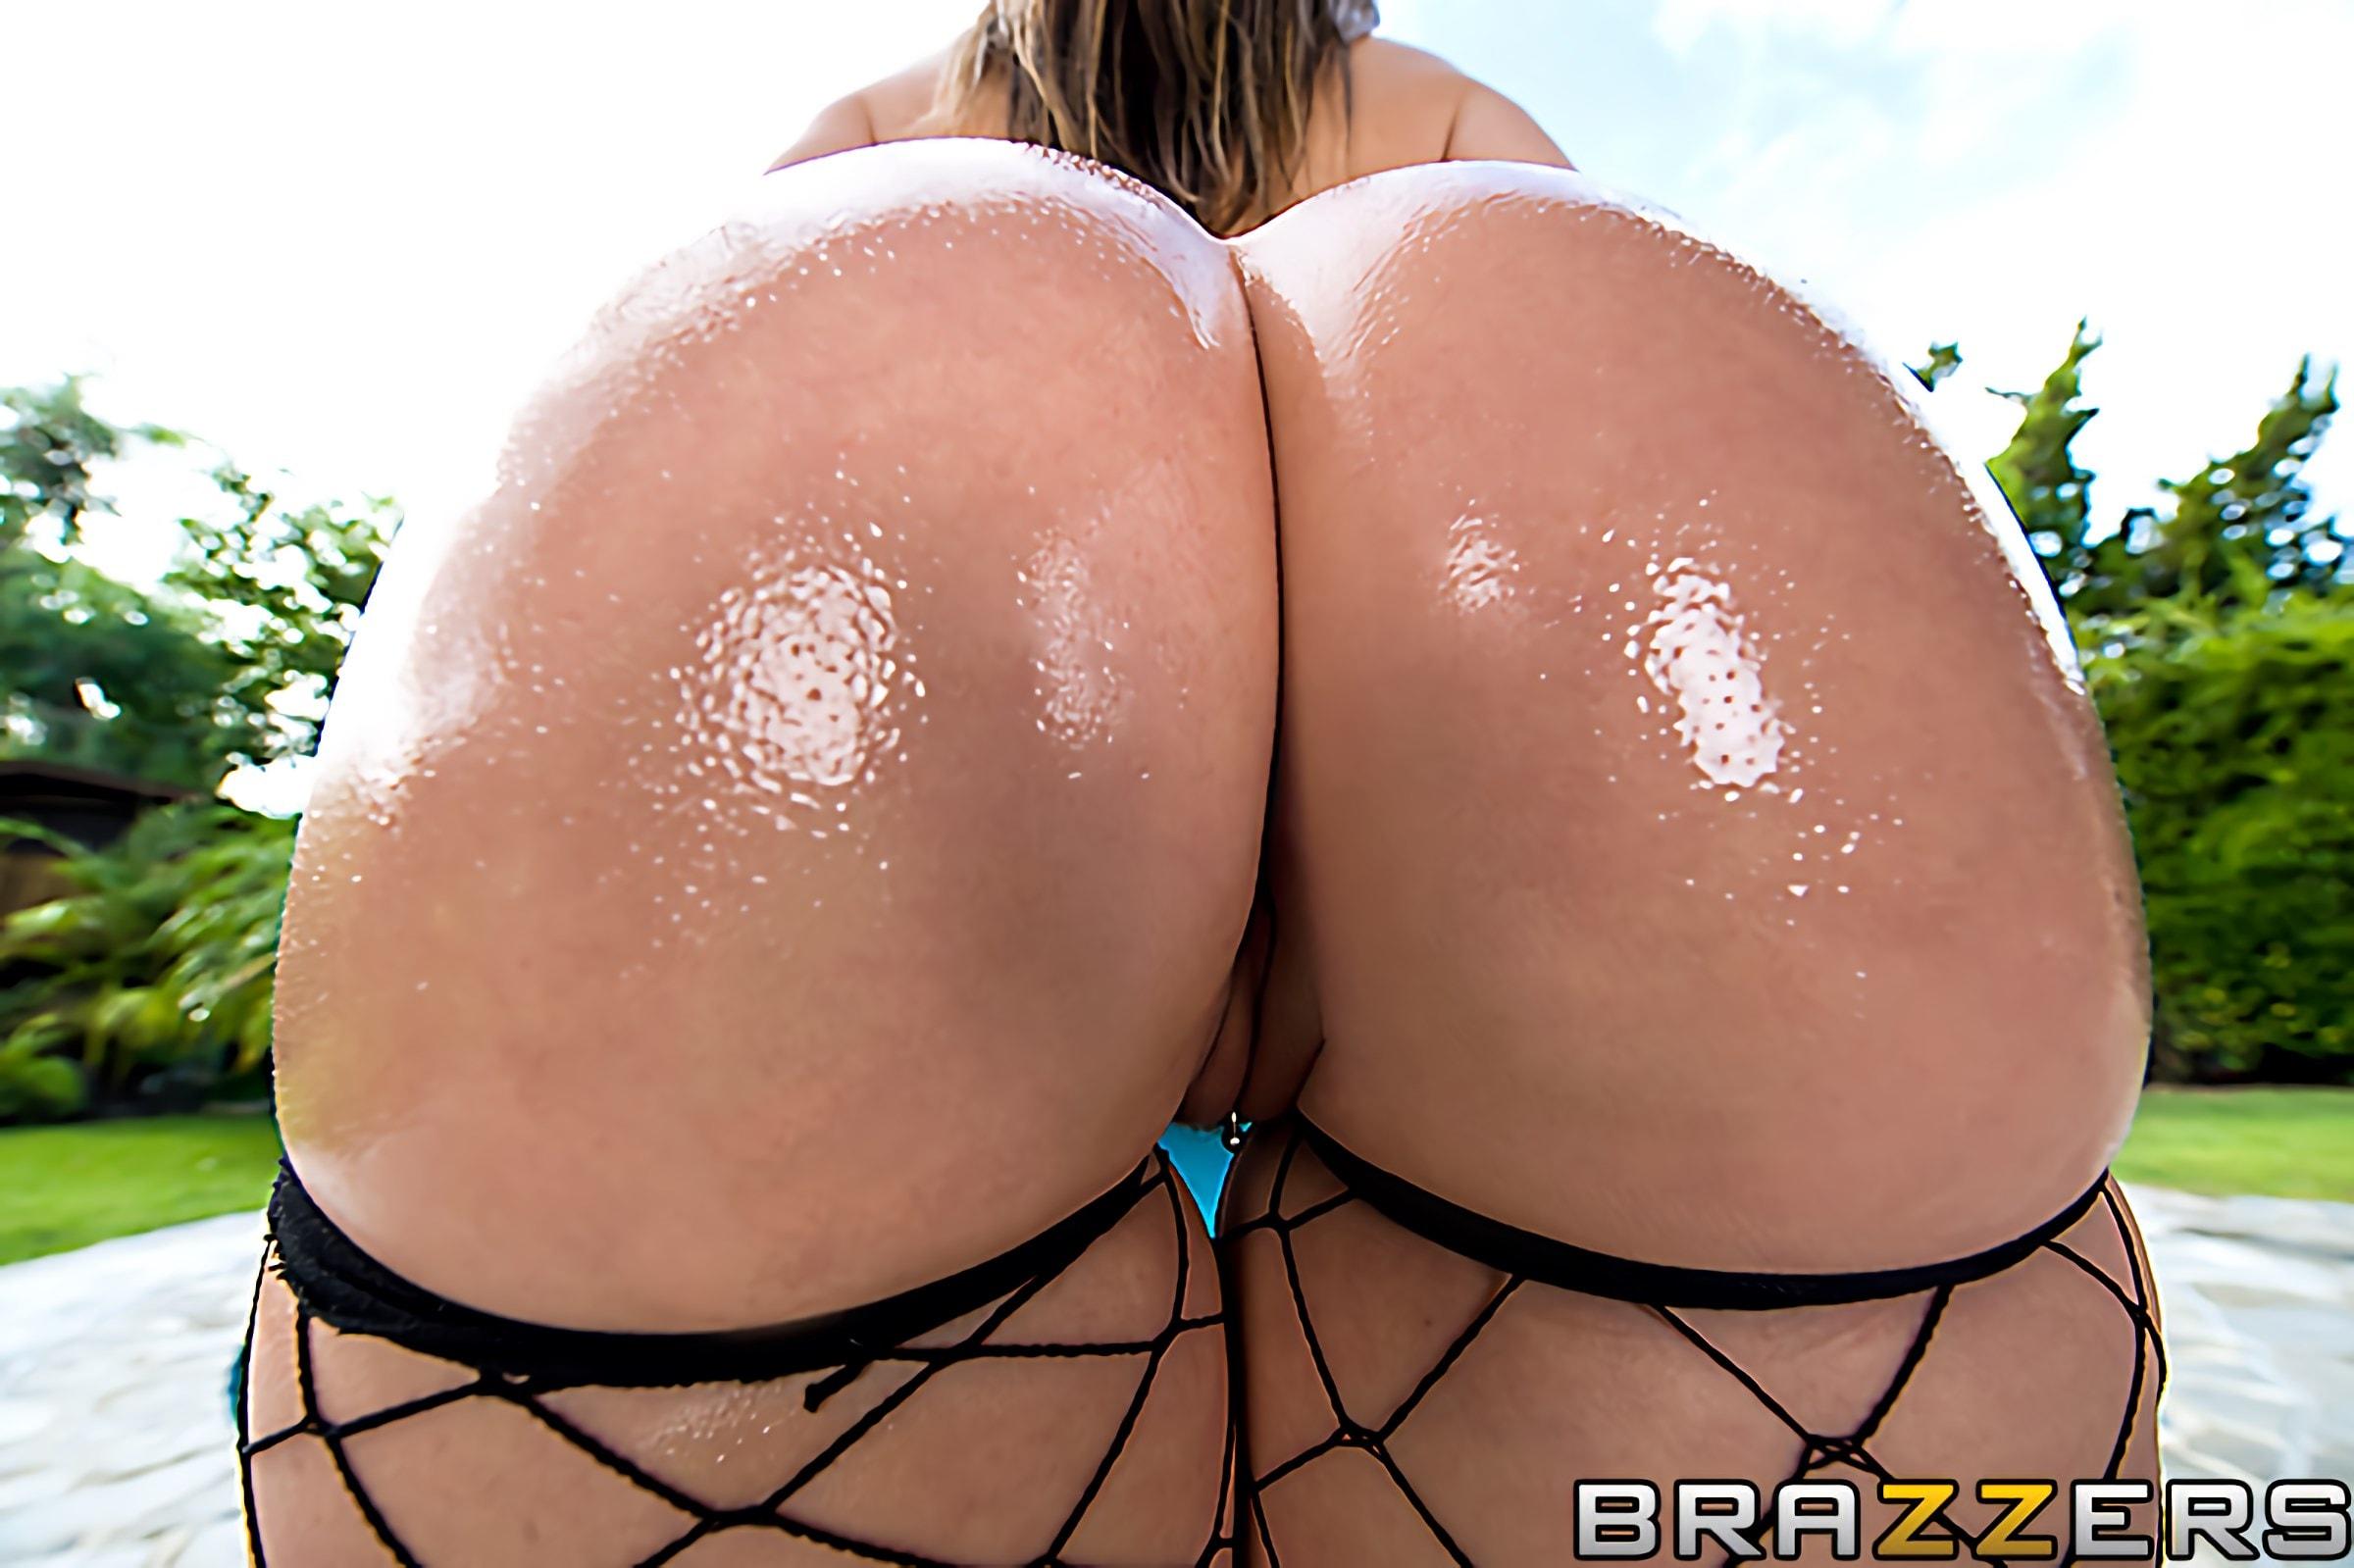 Brazzers 'Get In That Booty' starring Courtney Cummz (Photo 1)